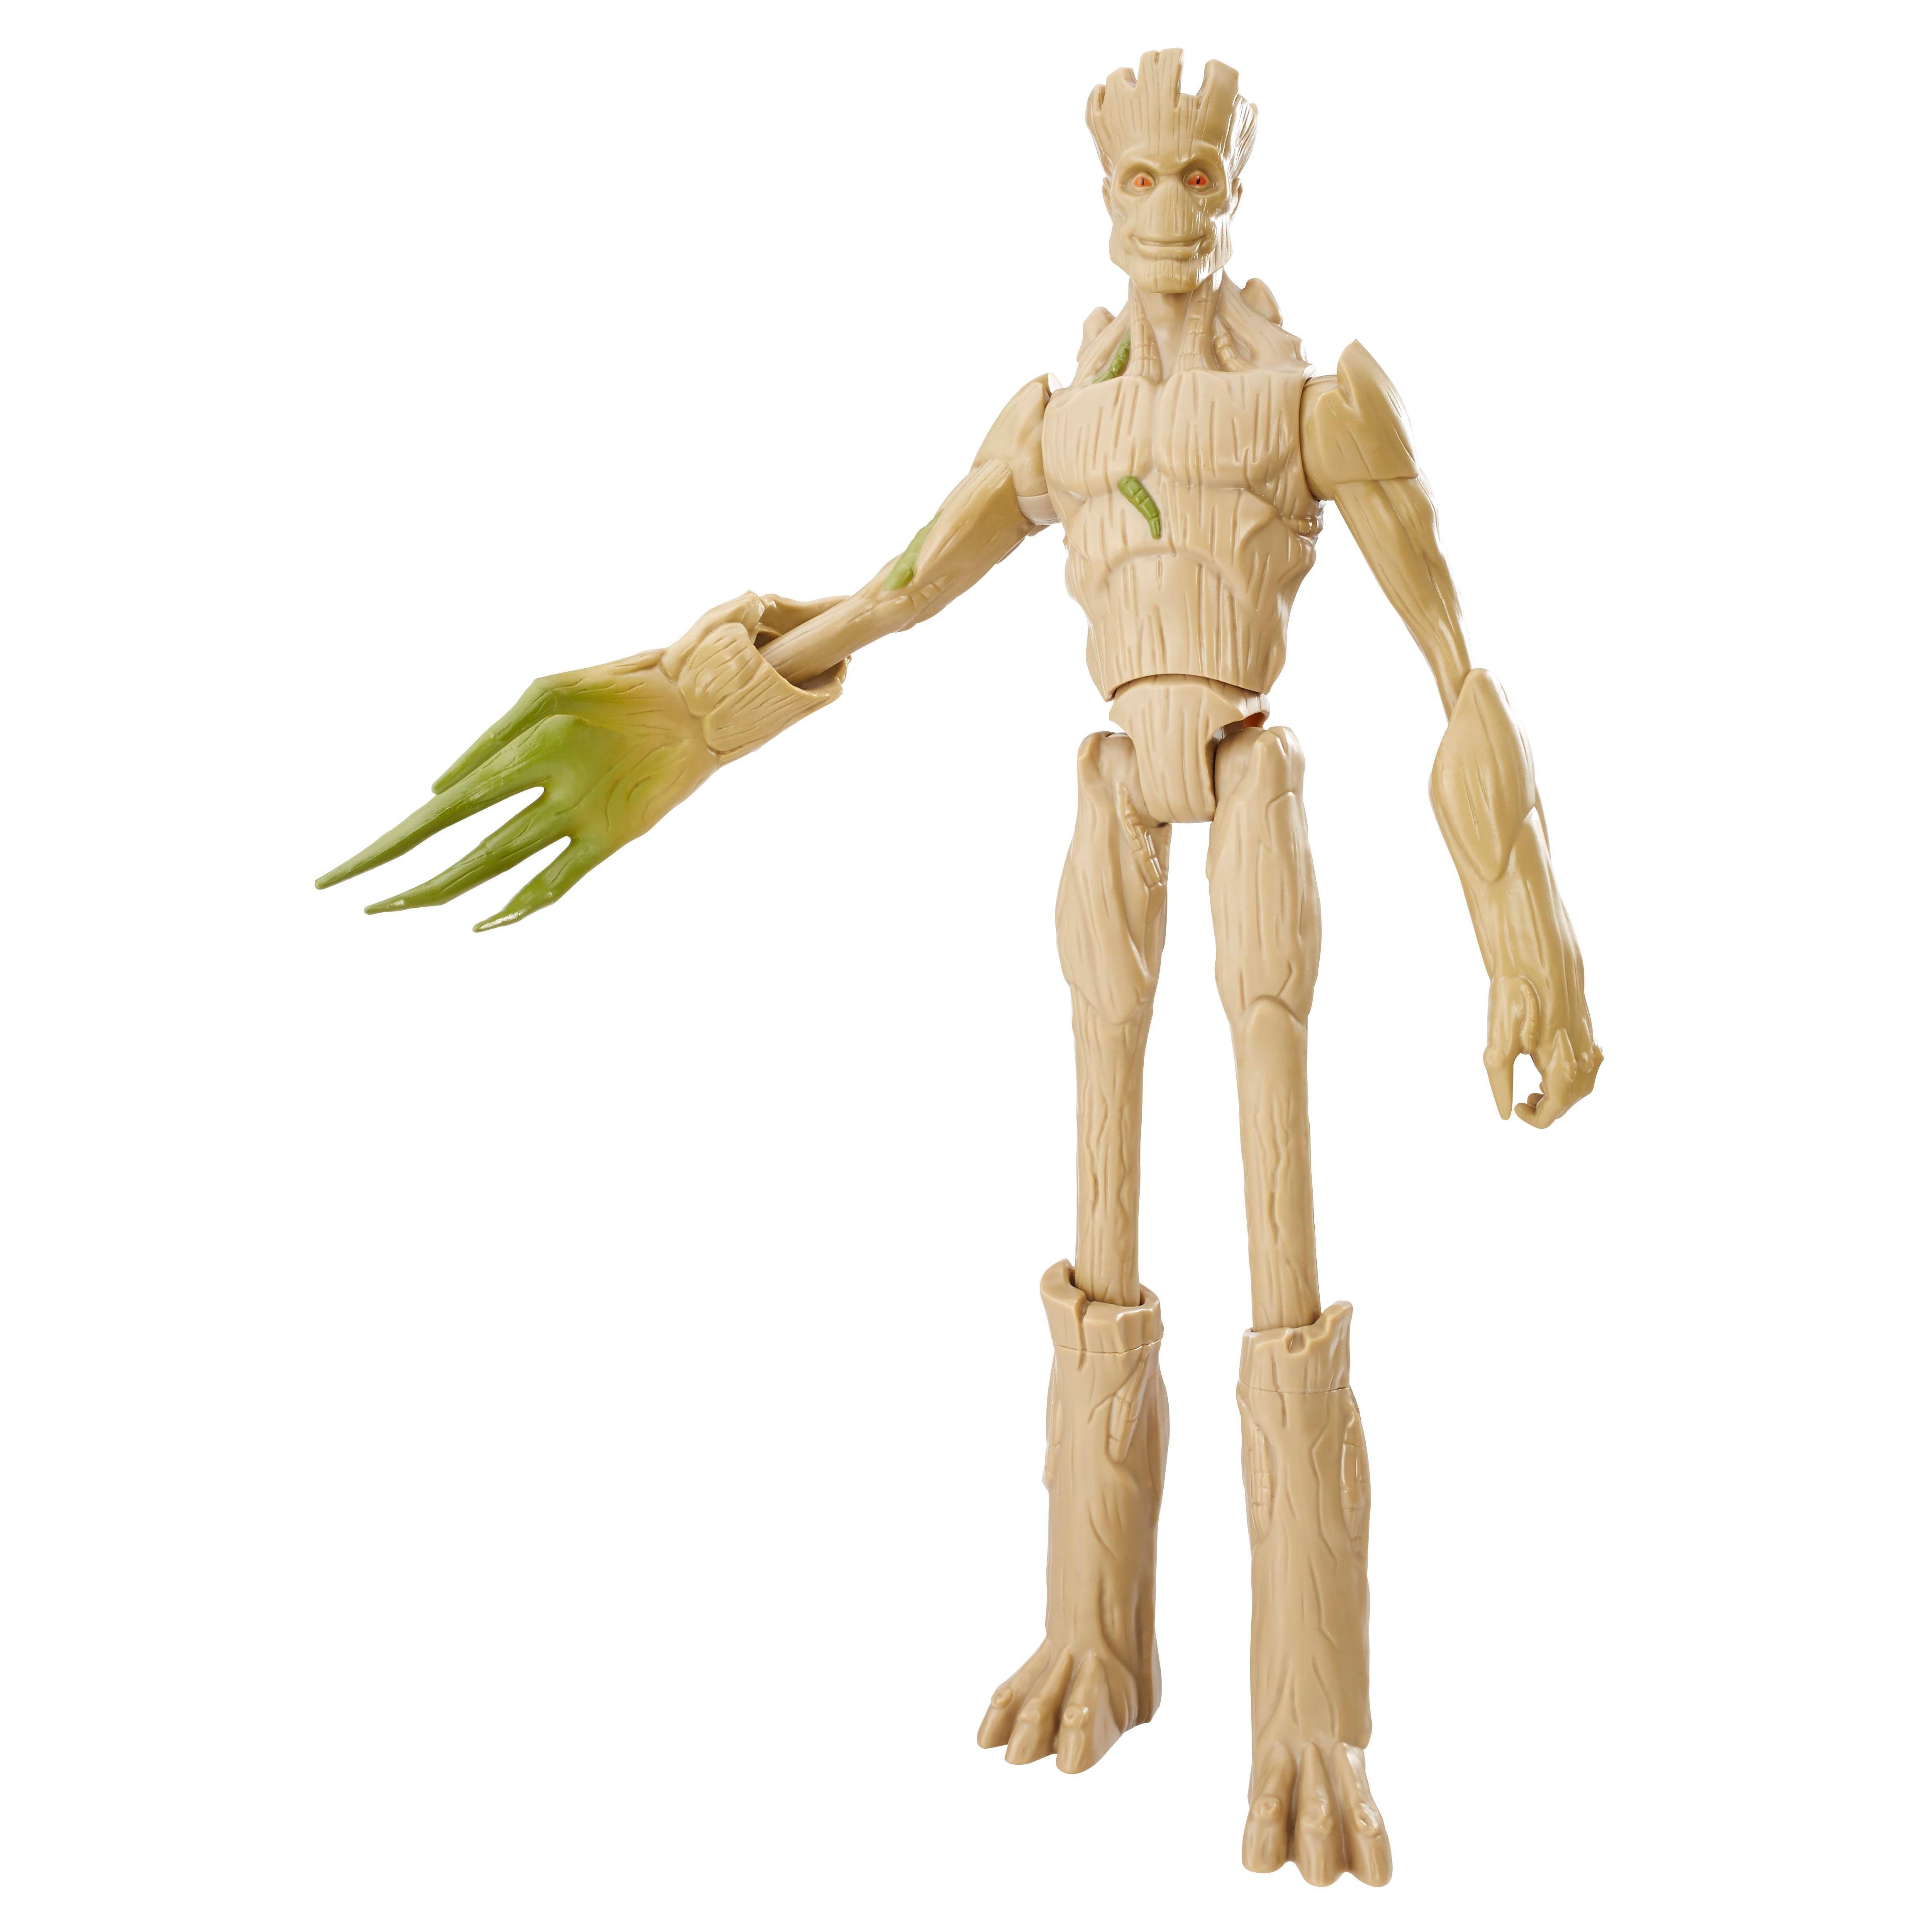 MARVEL GUARDIANS OF THE GALAXY TITAN HERO DELUXE GROWING GROOT Figure - oop